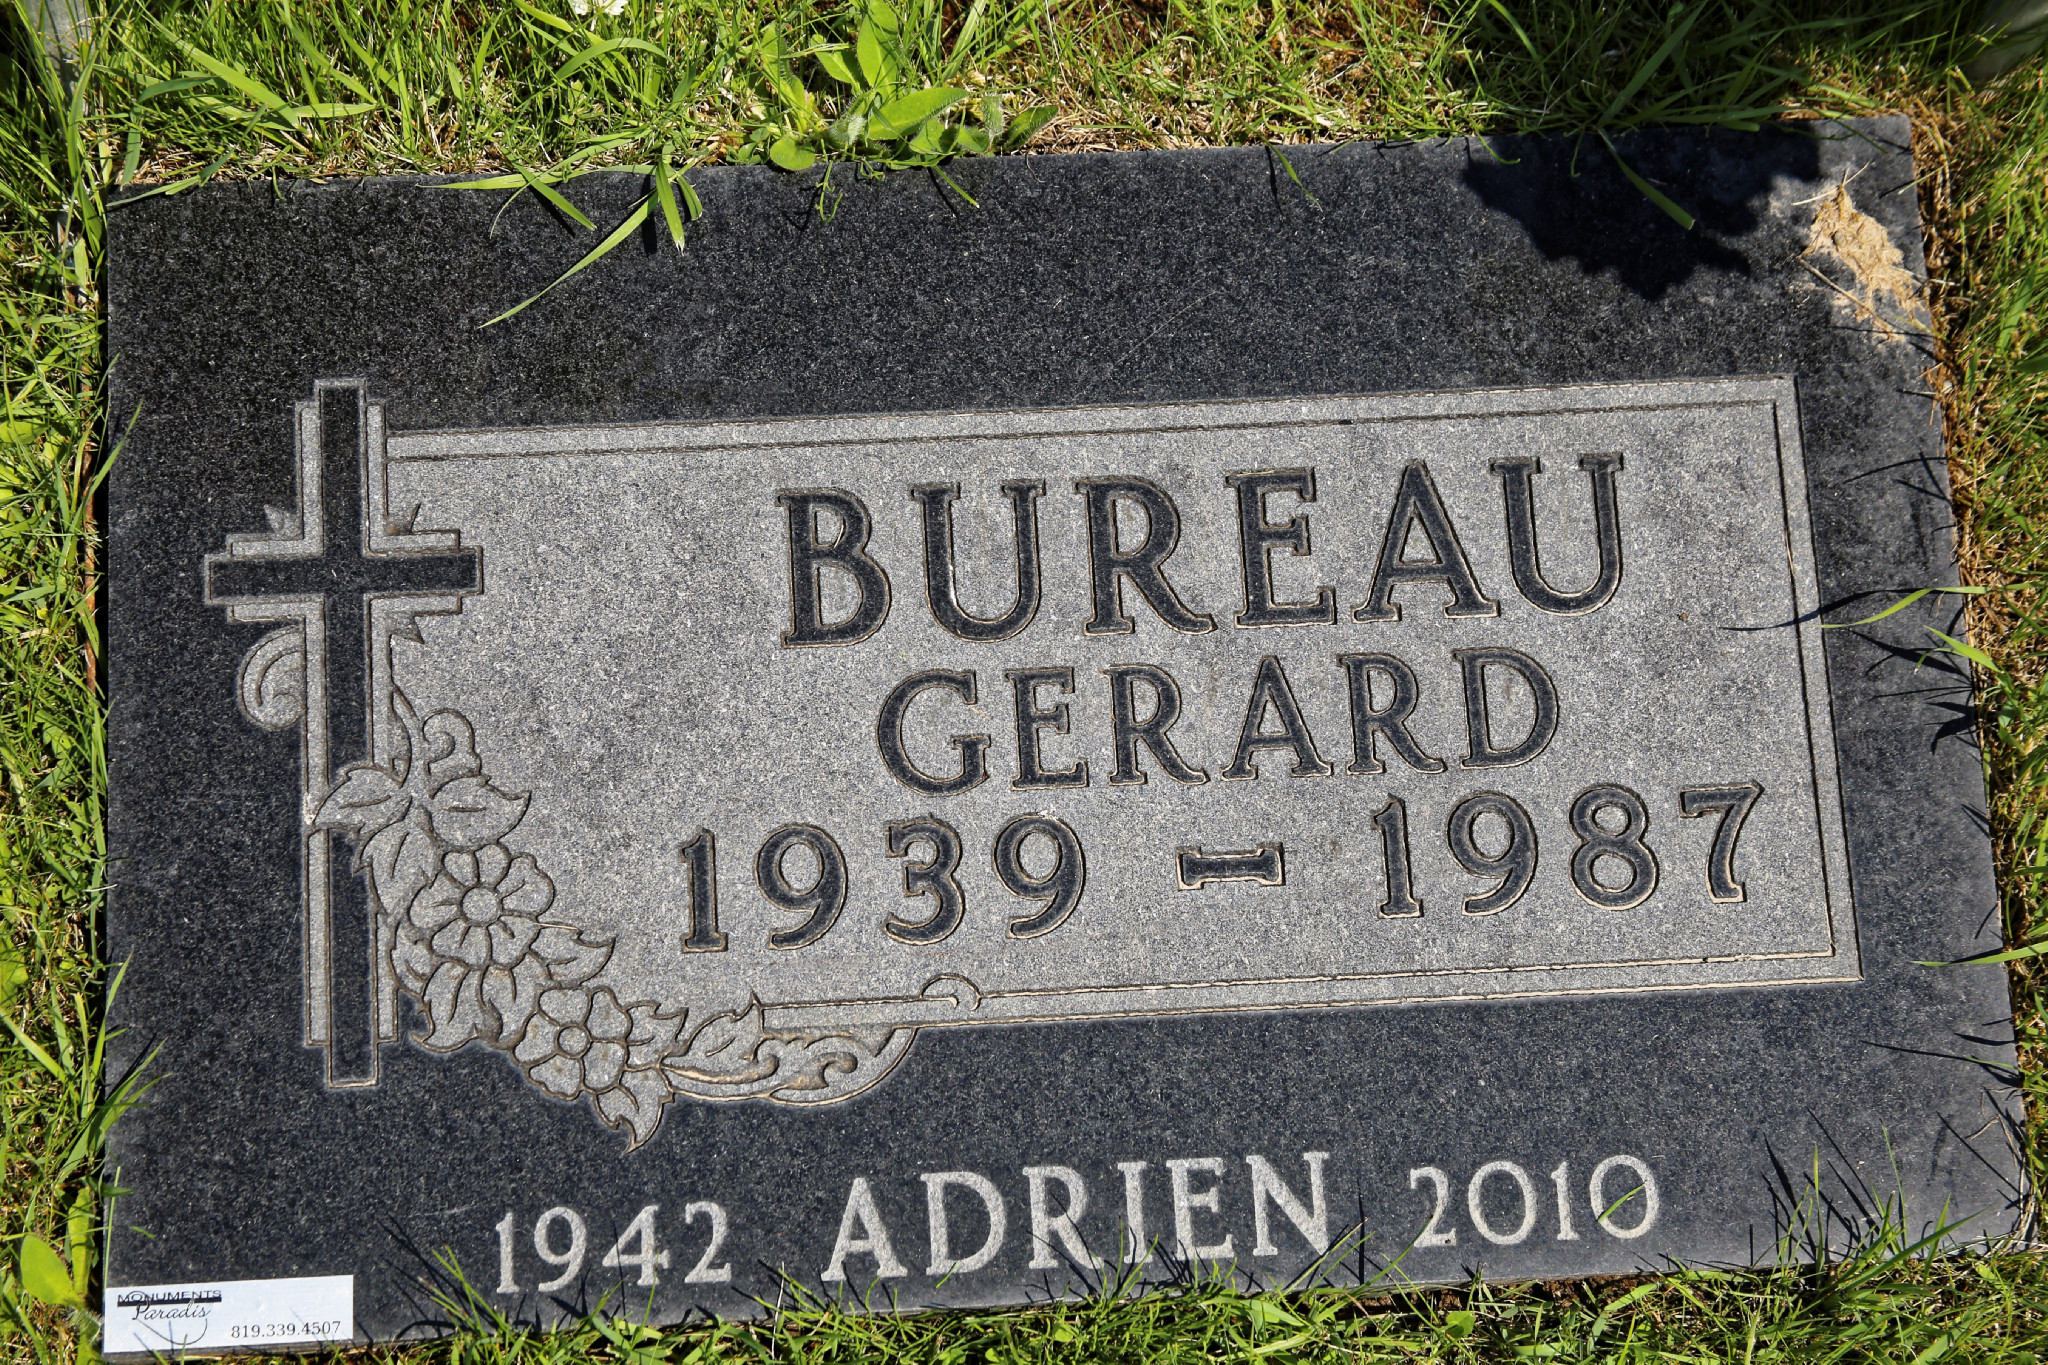 Gérard Bureau